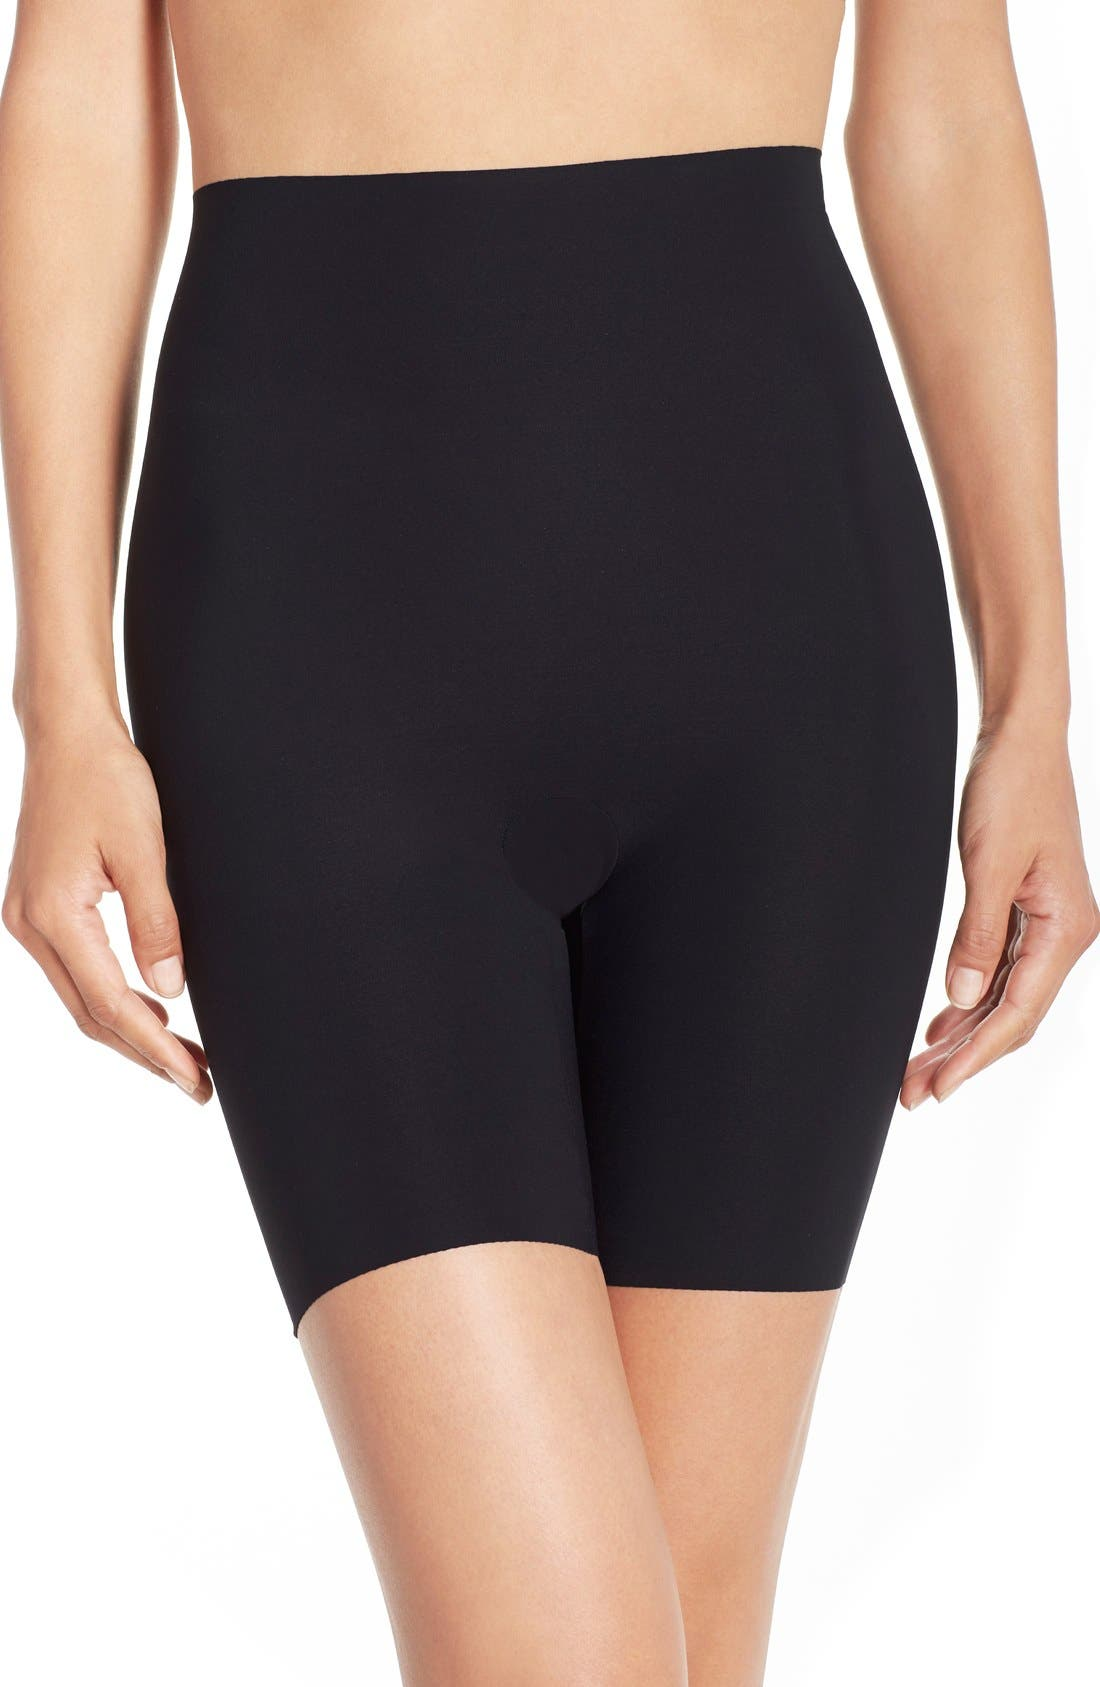 Main Image - Commando 'Control' High Waist Shaping Shorts